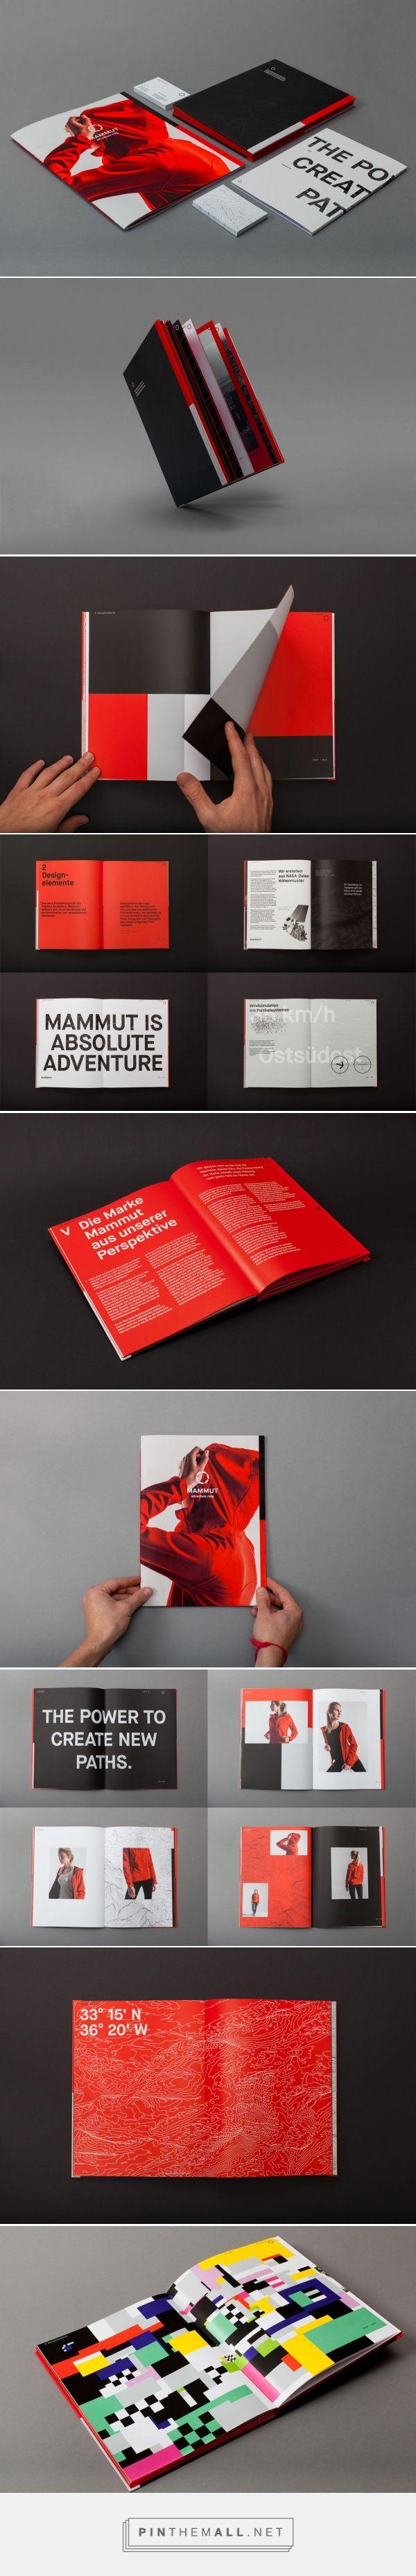 Interaktives Corporate Design by Oho! Balls & Sticks                                                                                                                                                     Mehr